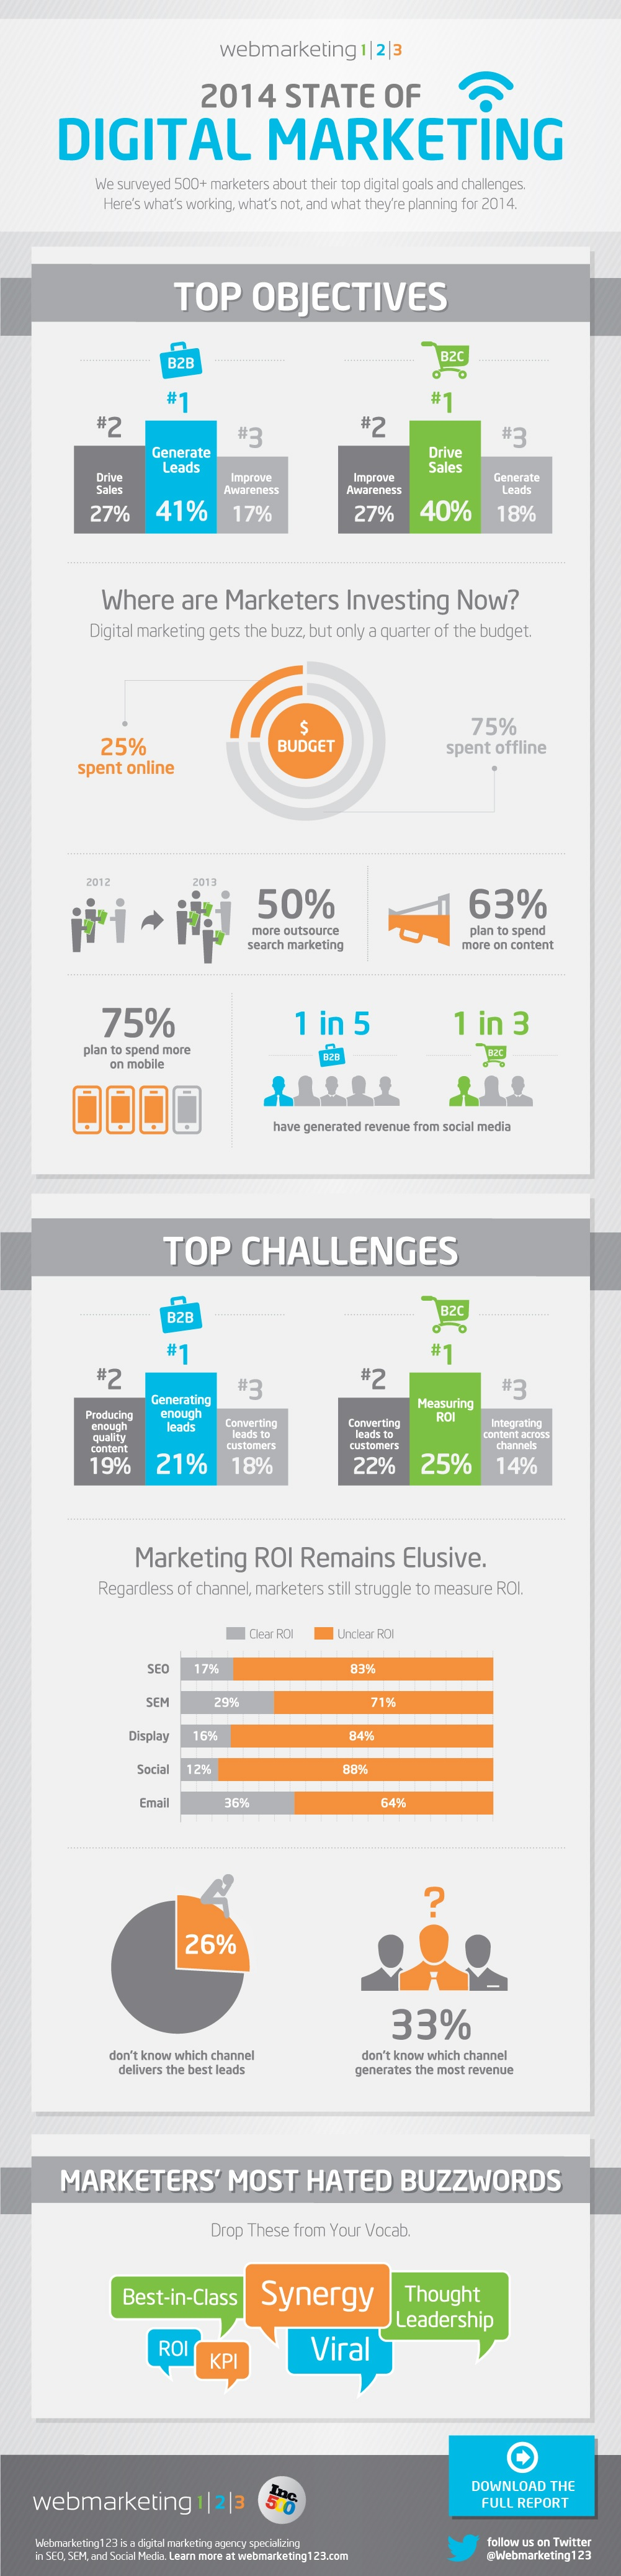 2014-state-of-digital-marketing